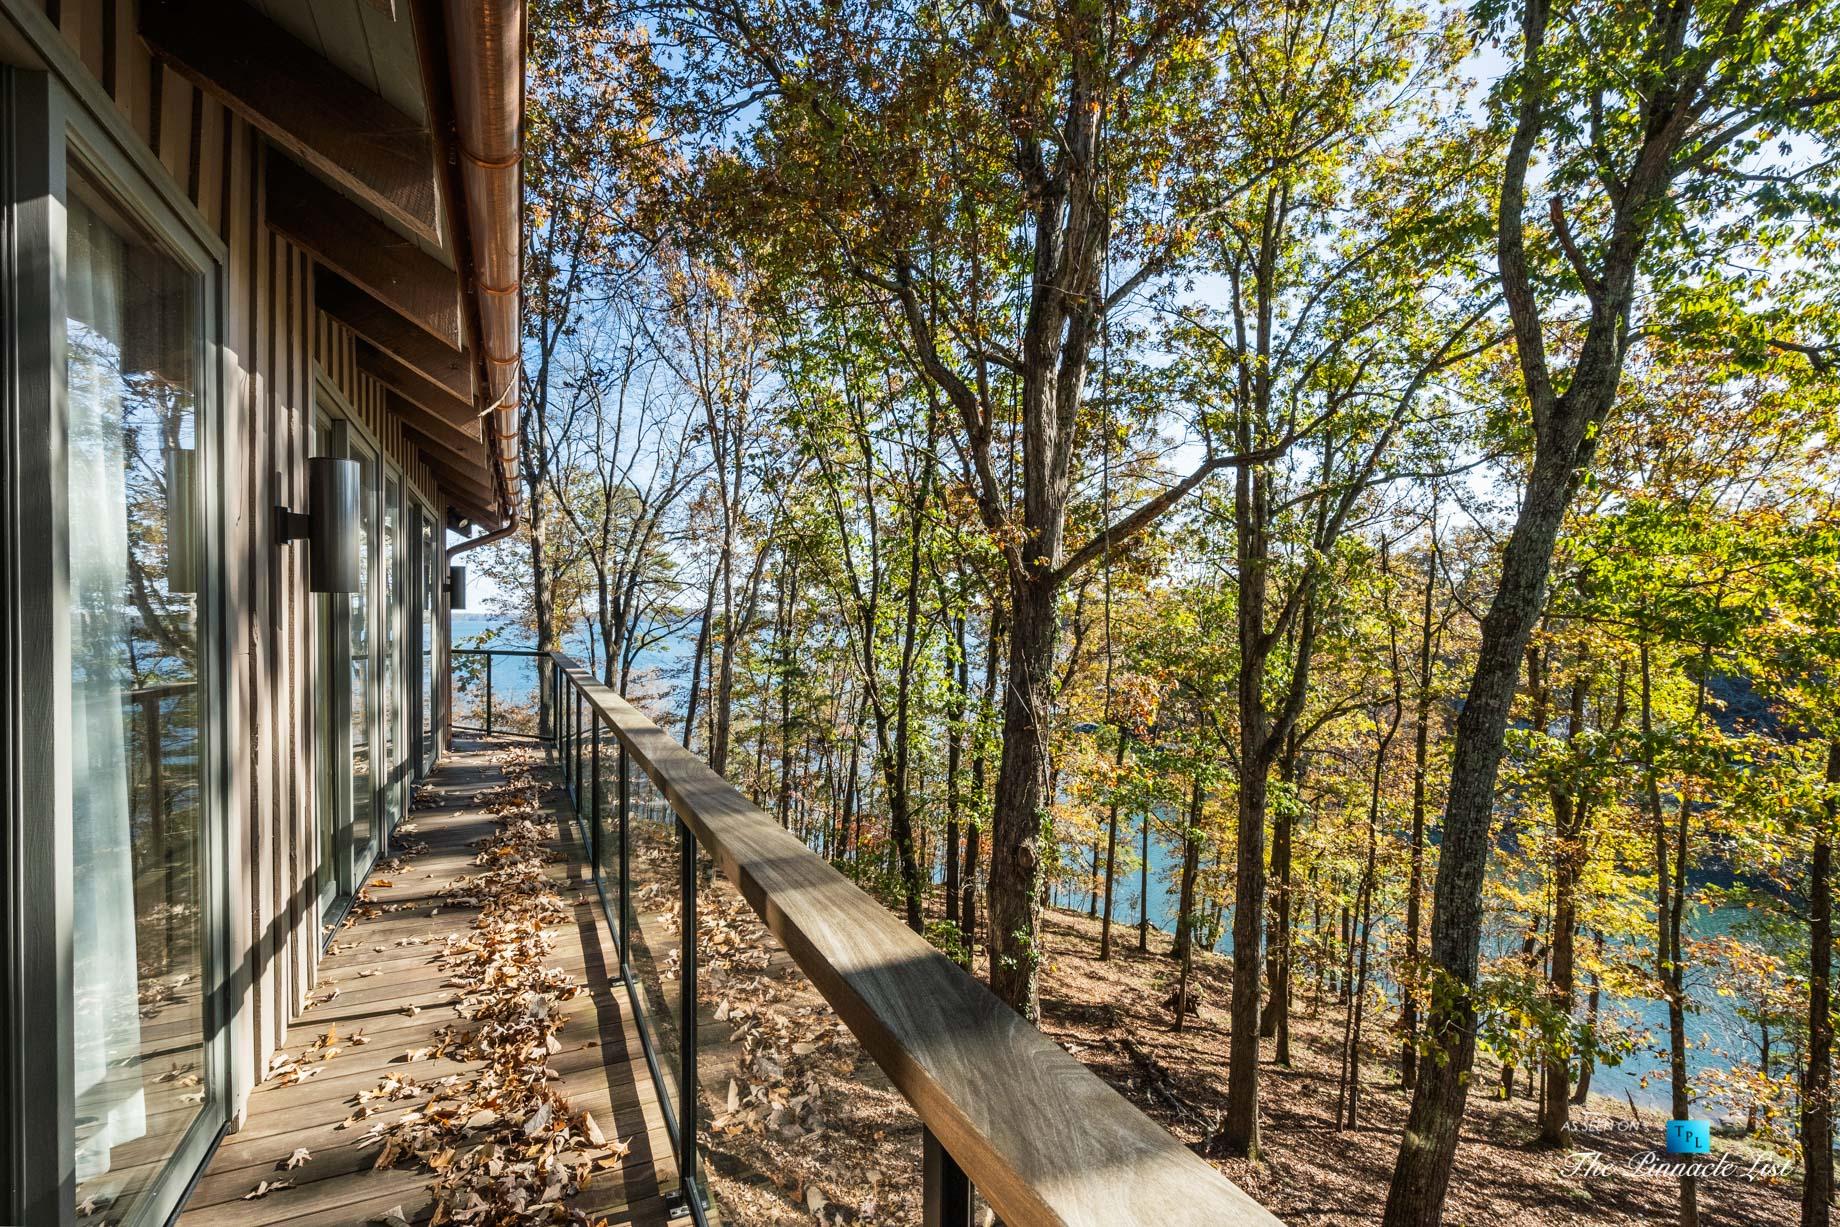 7860 Chestnut Hill Rd, Cumming, GA, USA – Deck Lake View – Luxury Real Estate – Lake Lanier Mid-Century Modern Stone Home